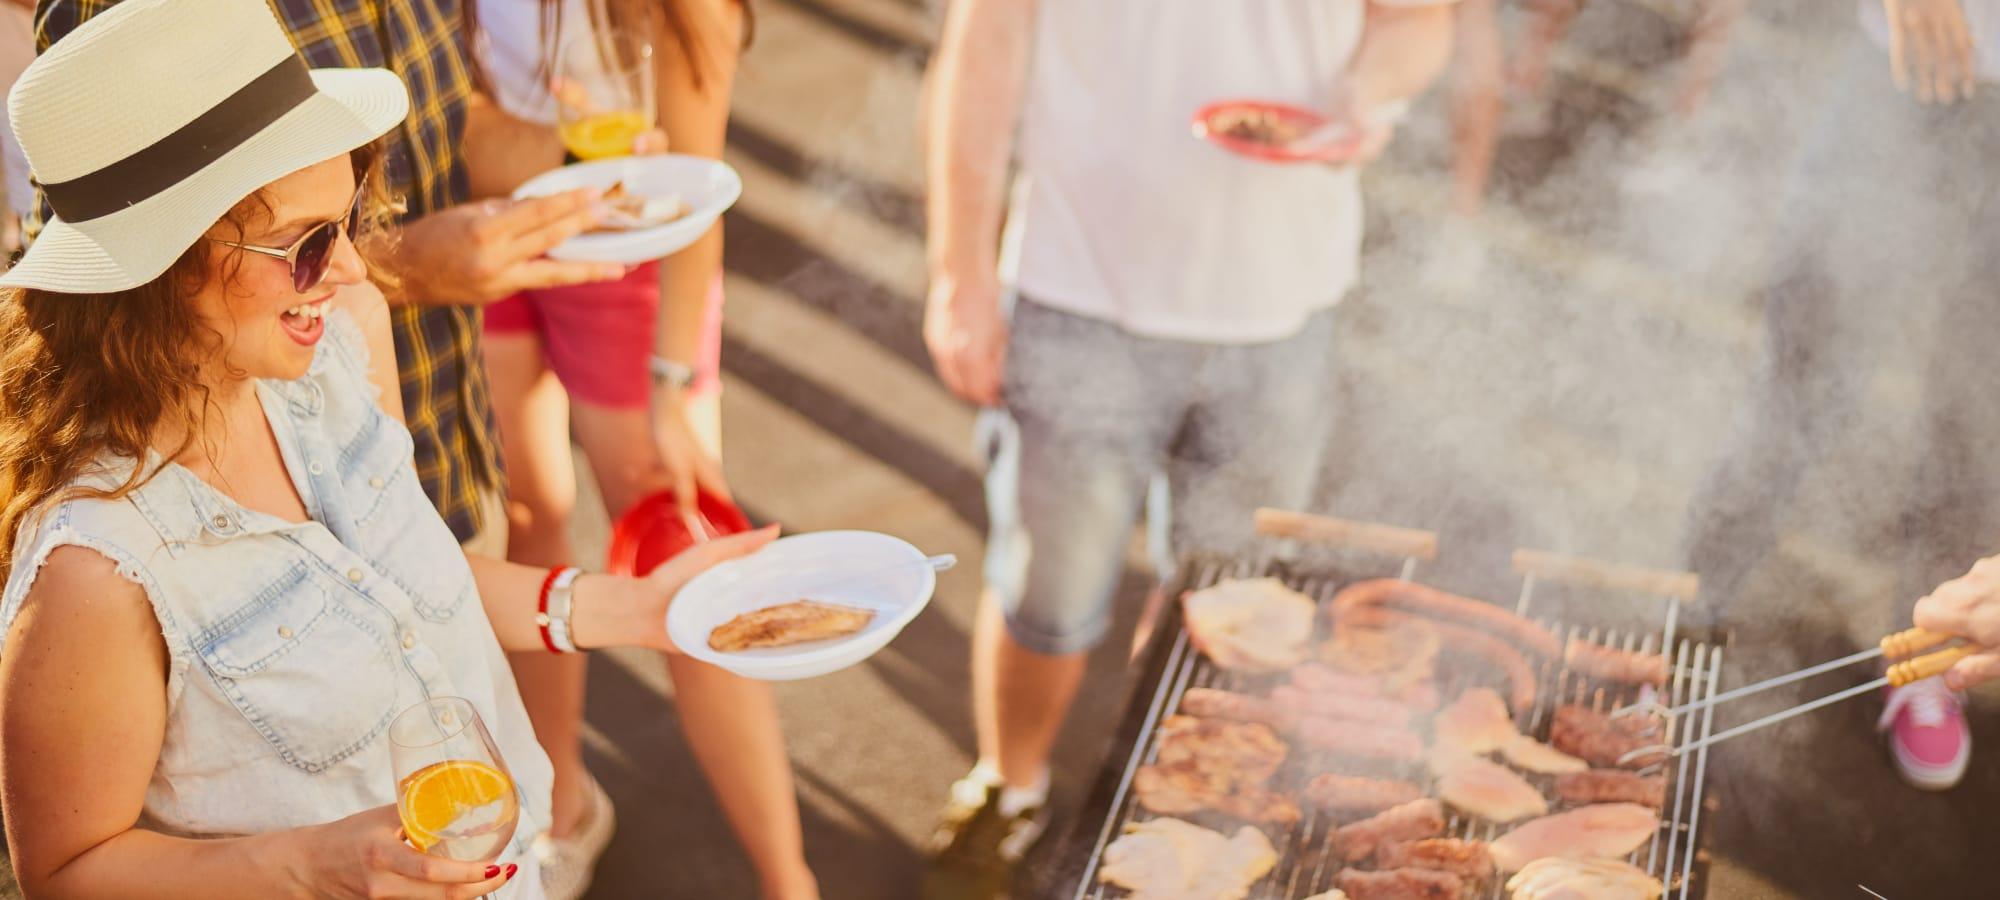 Residents enjoying an outdoor grill at Villa Vita Apartments in Peoria, Arizona